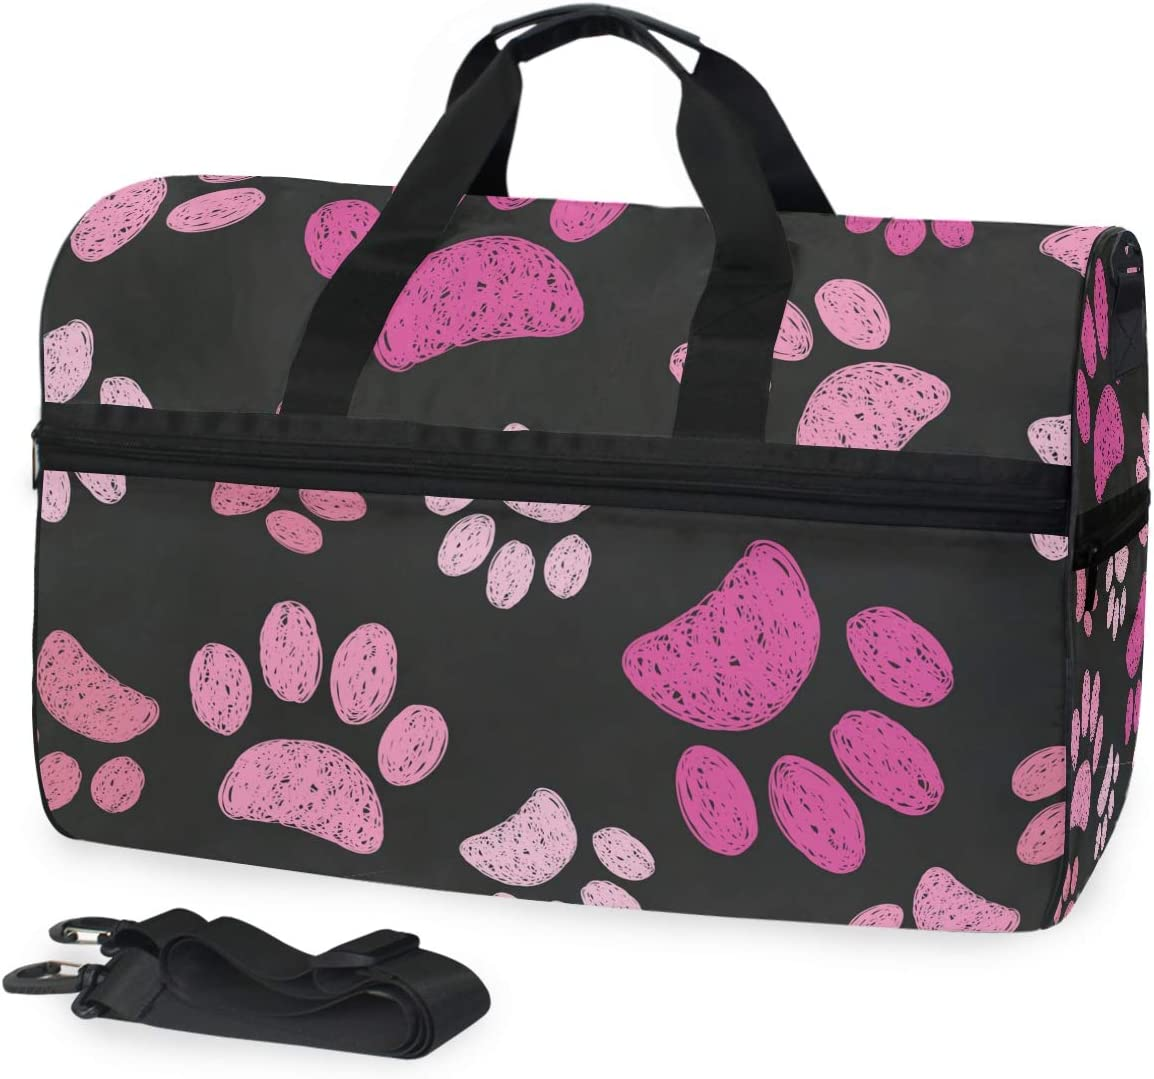 Travel Duffels Pink Paw Duffle Bag Luggage Sports Gym for Women /& Men